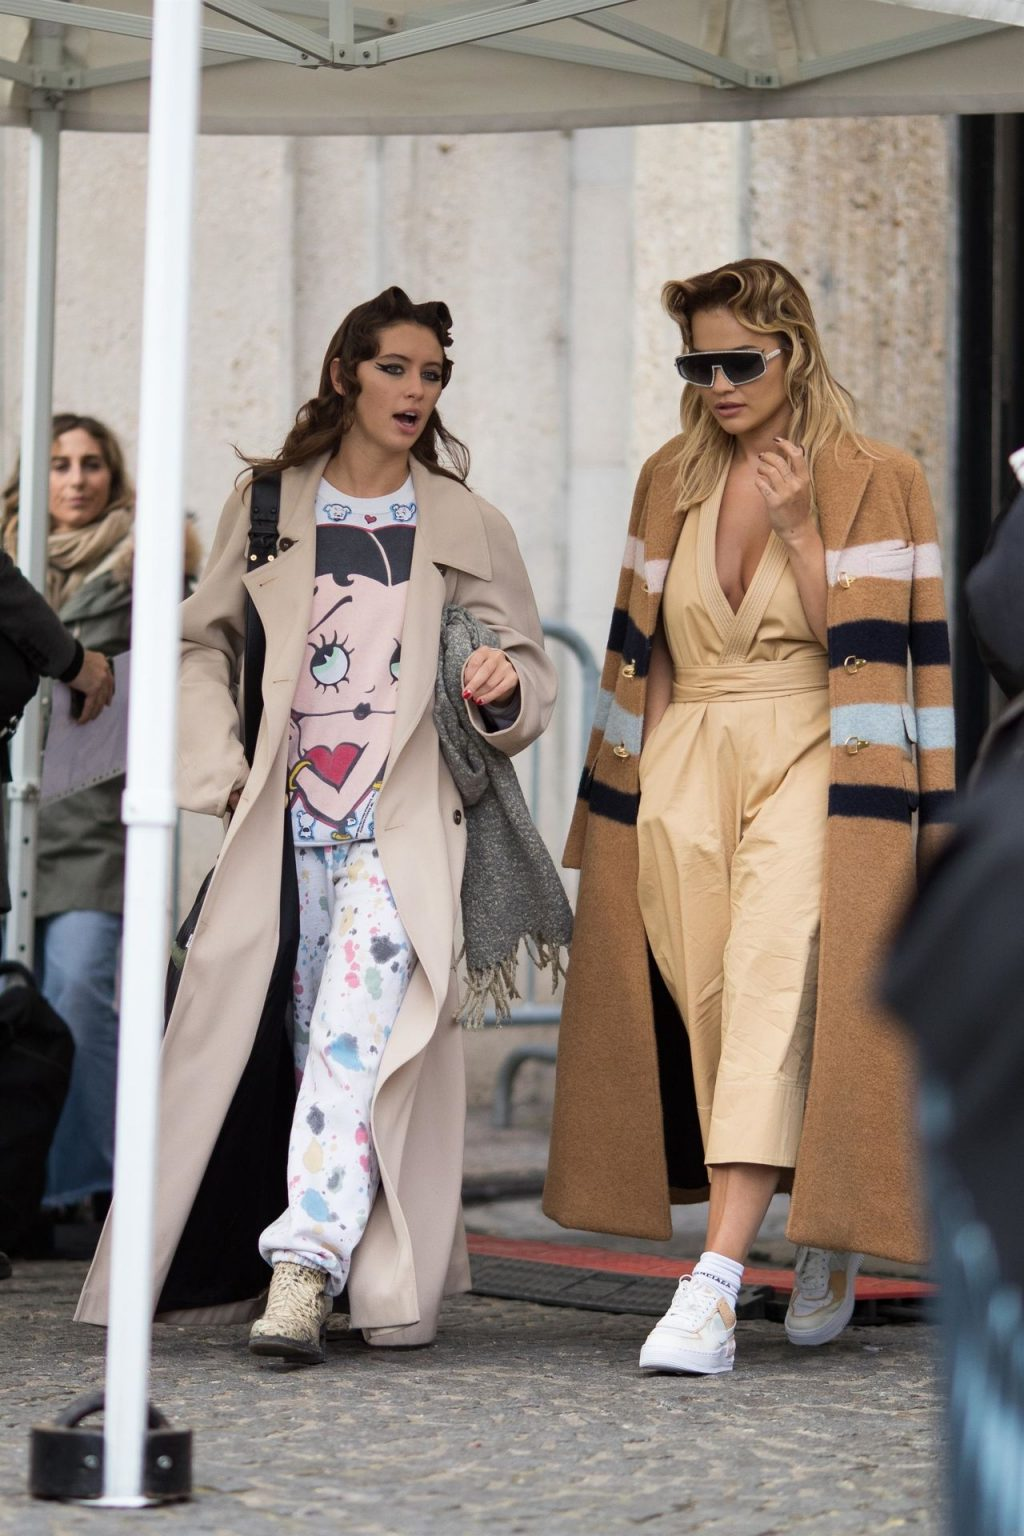 Rita Ora Pictured During the Miu Miu Fashion Show (13 Photos)